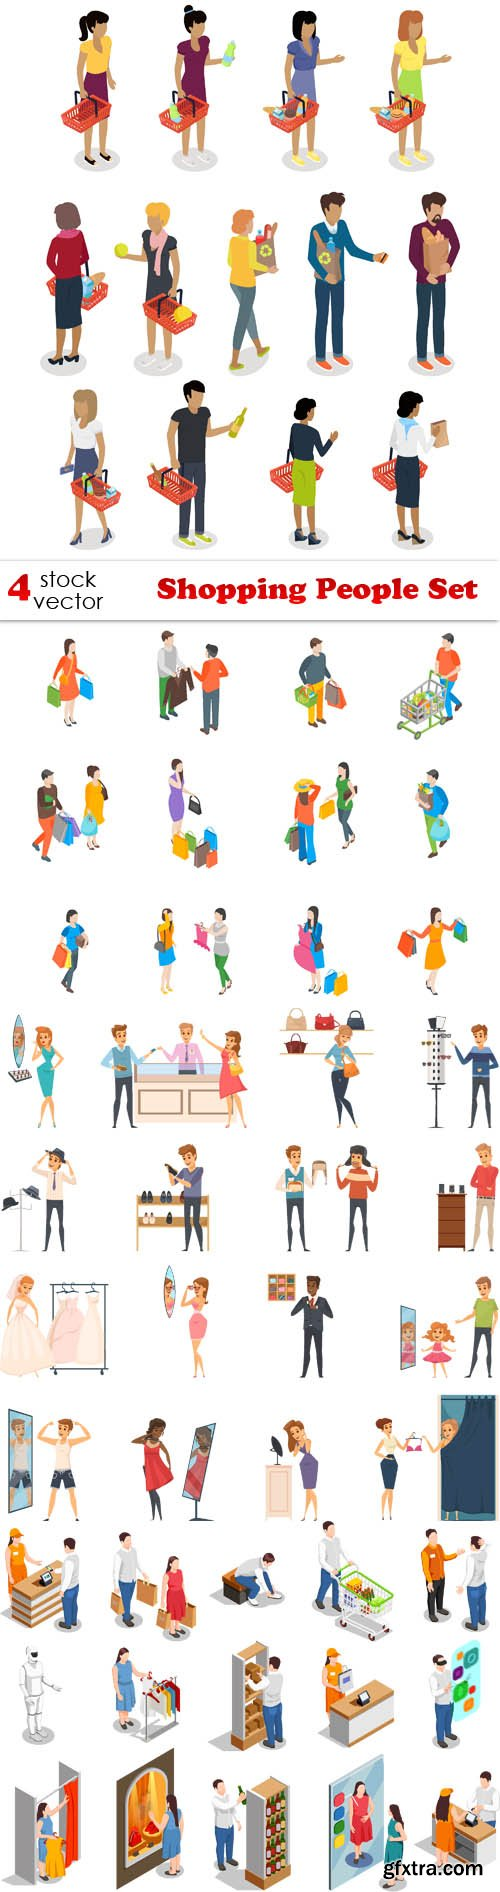 Vectors - Shopping People Set